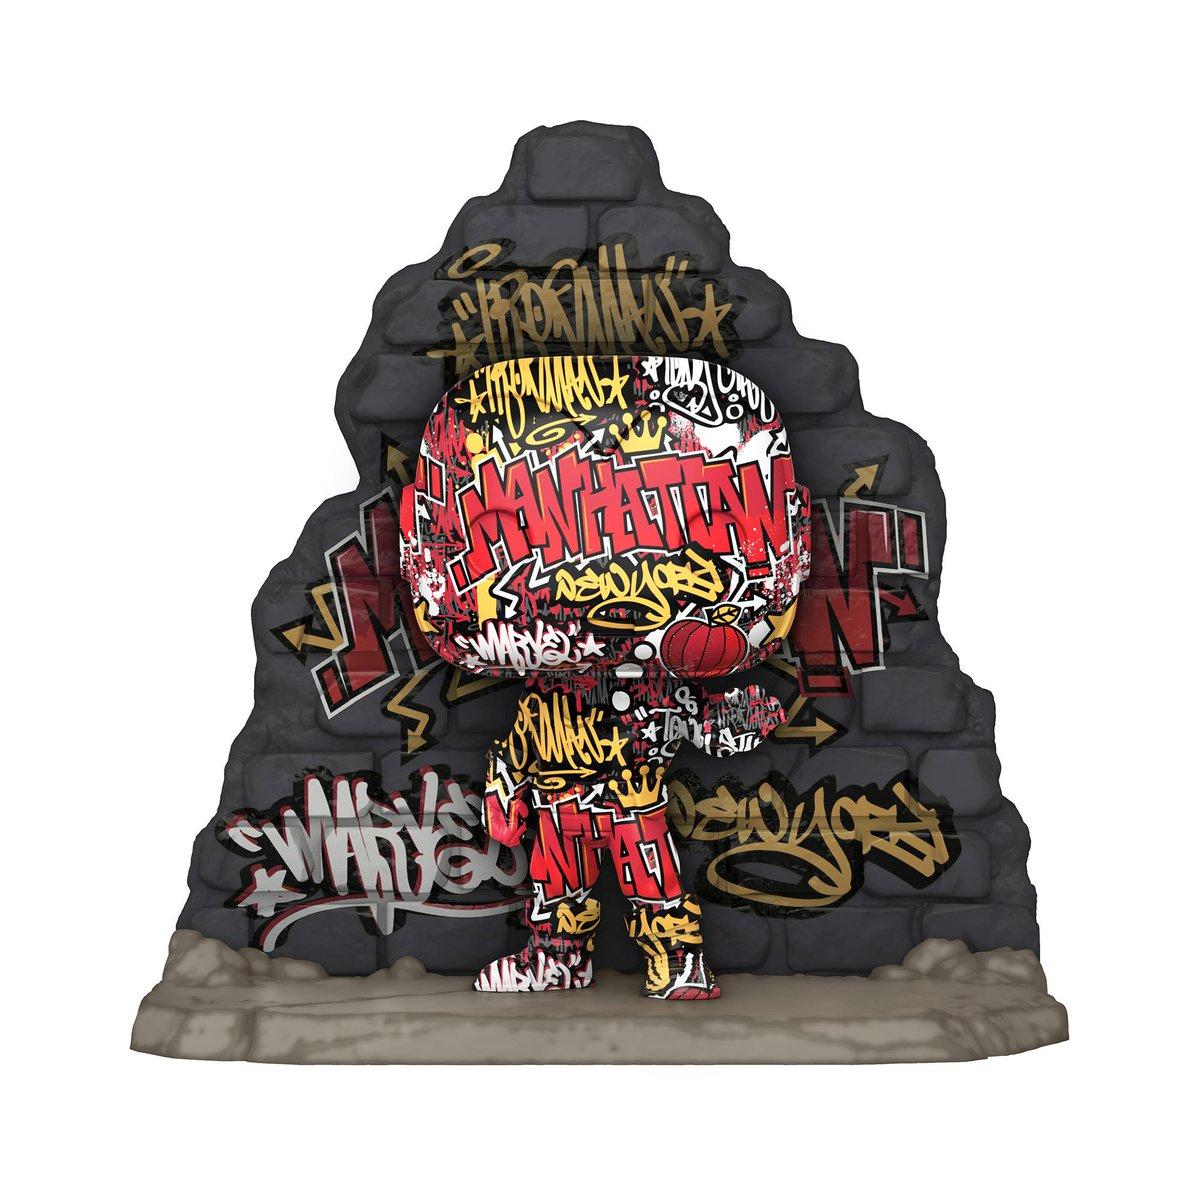 Rt & follow @OriginalFunko for the chance to WIN this @GameStop exclusive Street Art Iron Man Pop! Deluxe! #Funkogiveaway #giveaway #Marvel #Funko #FunkoPop